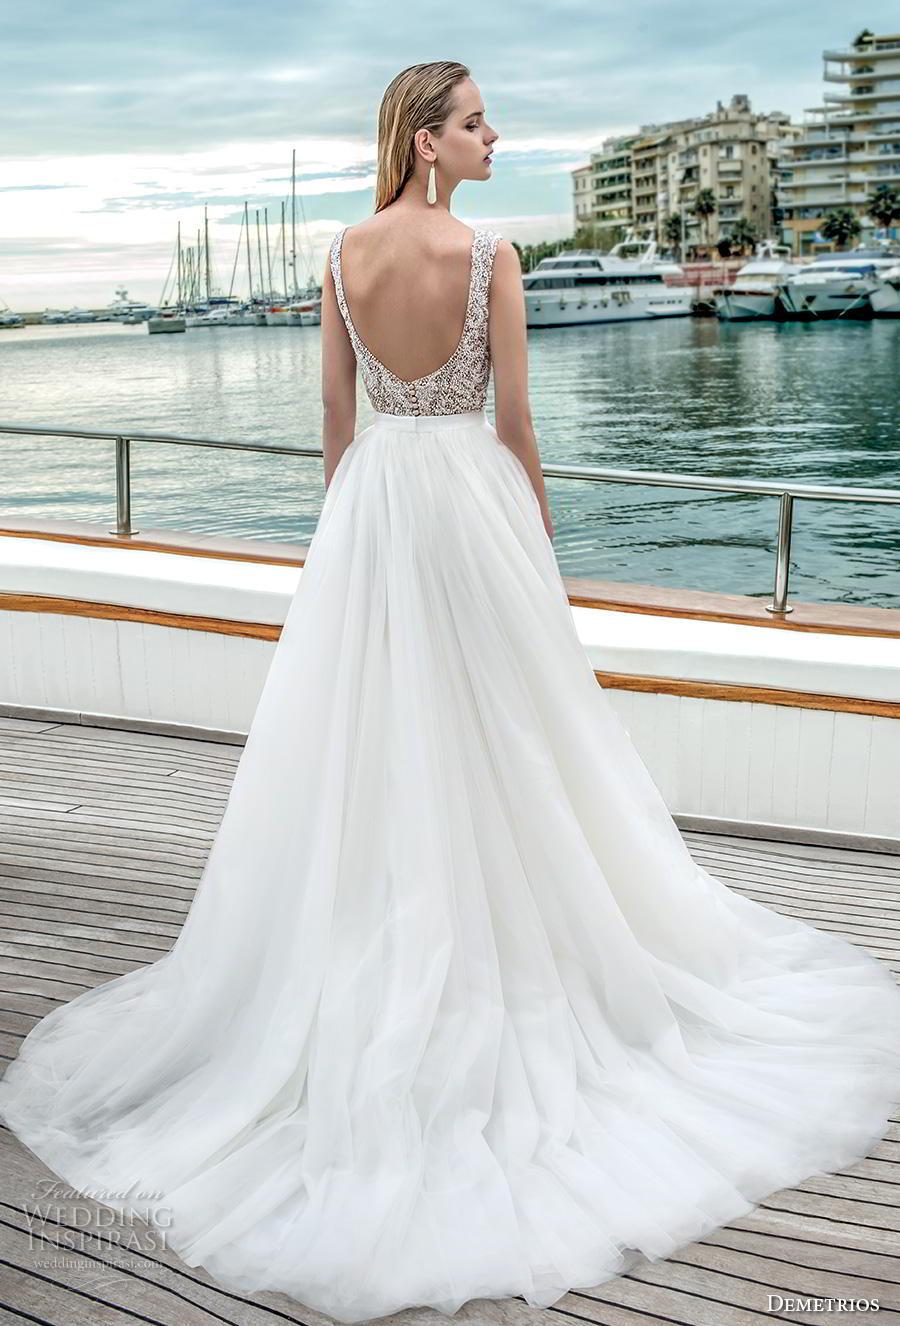 Destination Romance By Demetrios 2019 Wedding Dresses